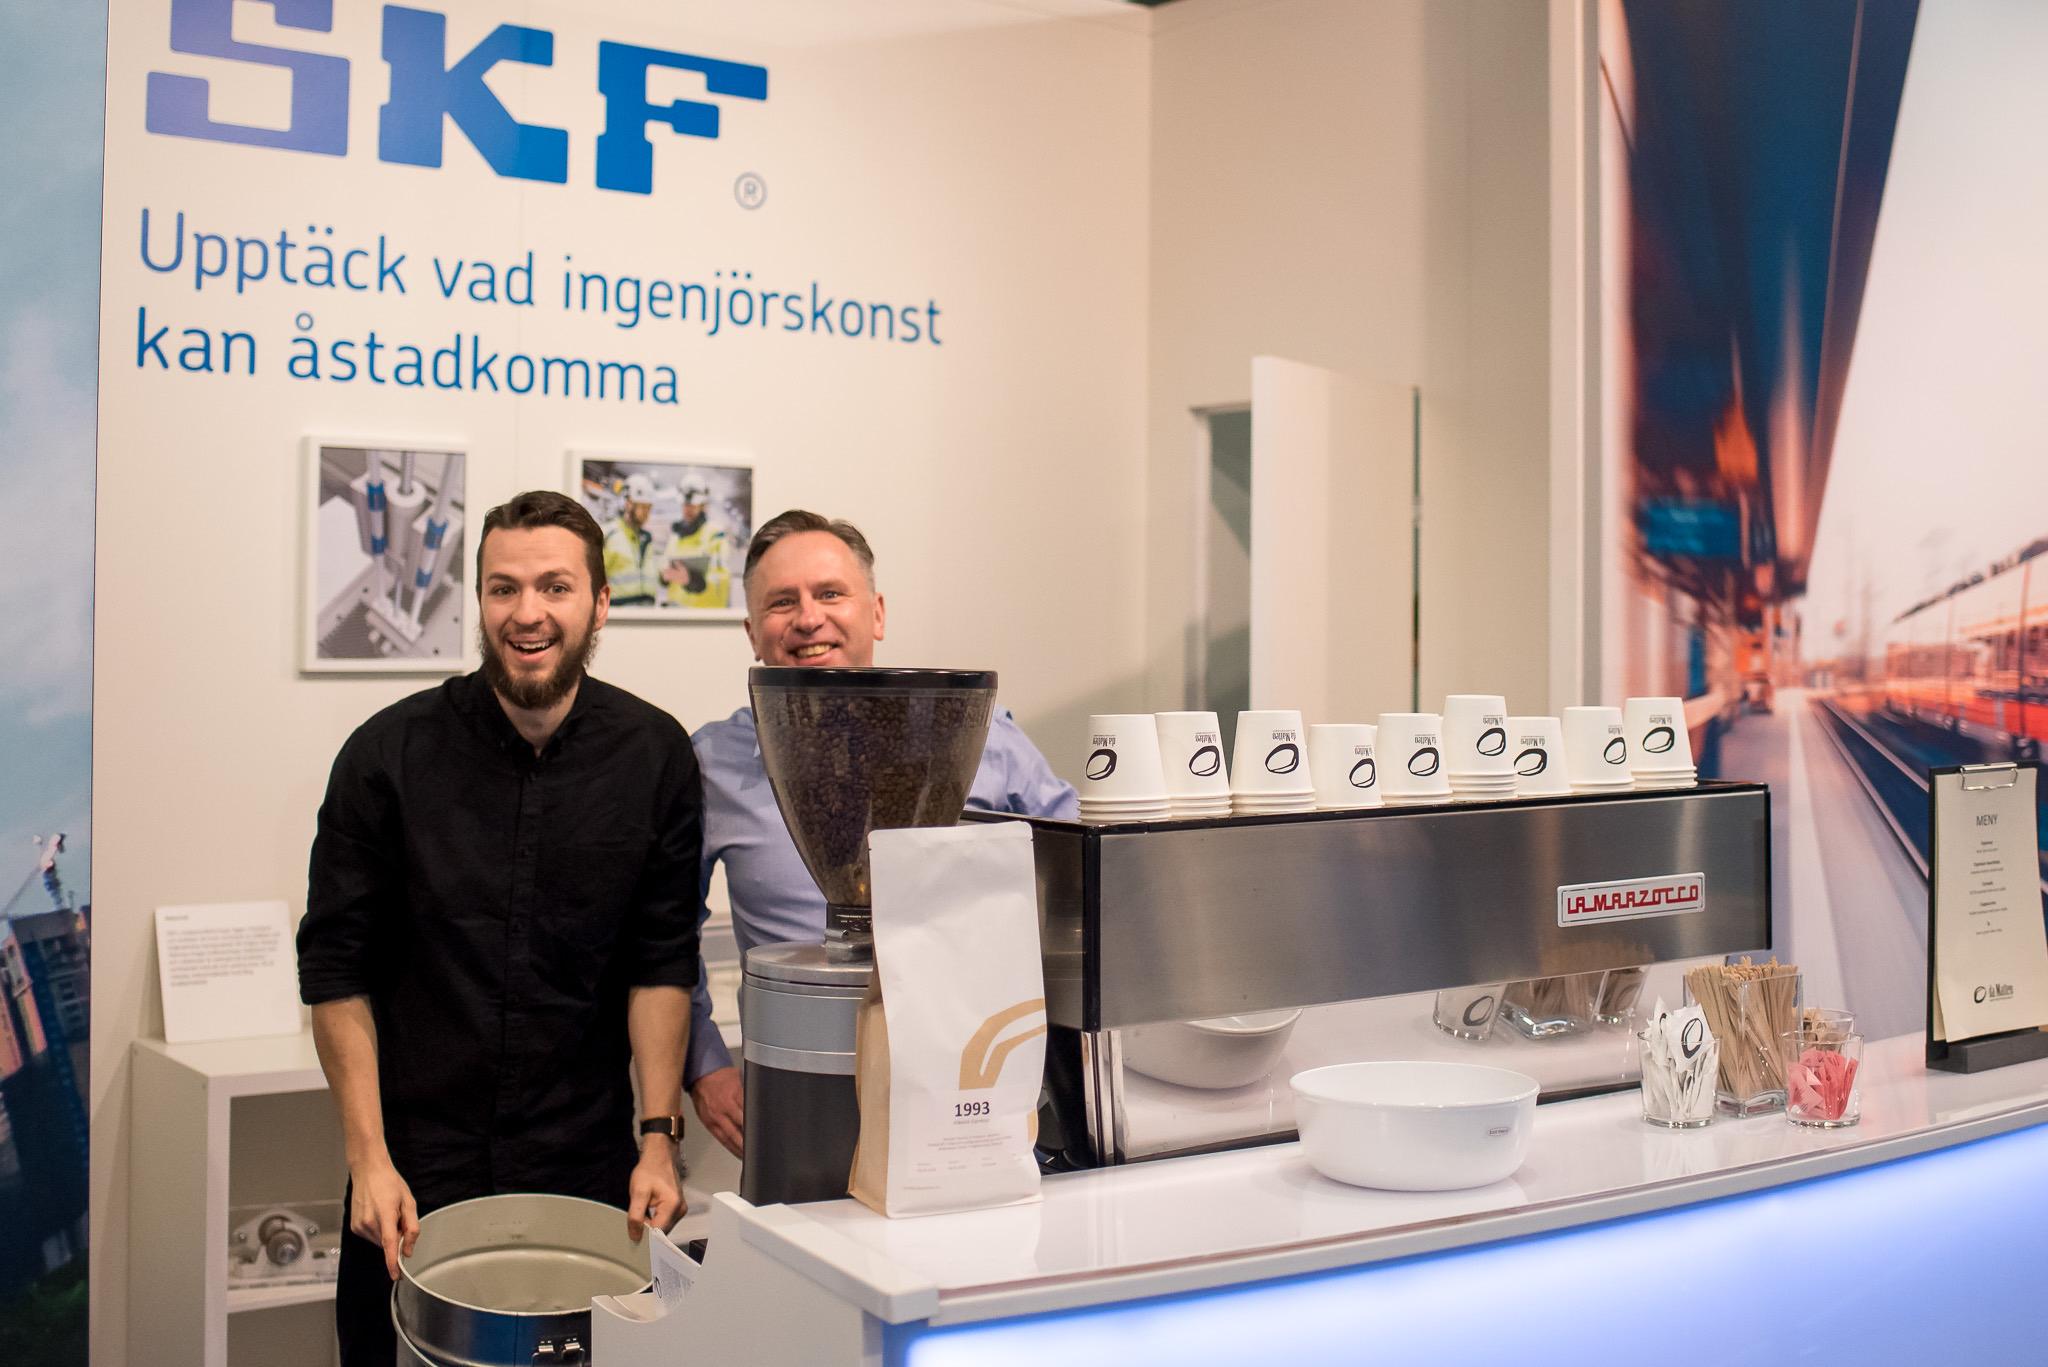 LED Bardisk Underhållsmässan 2018 SKF Underhållsmässan 2018 Photography Malin Lagerqvist www.frontrowex.se